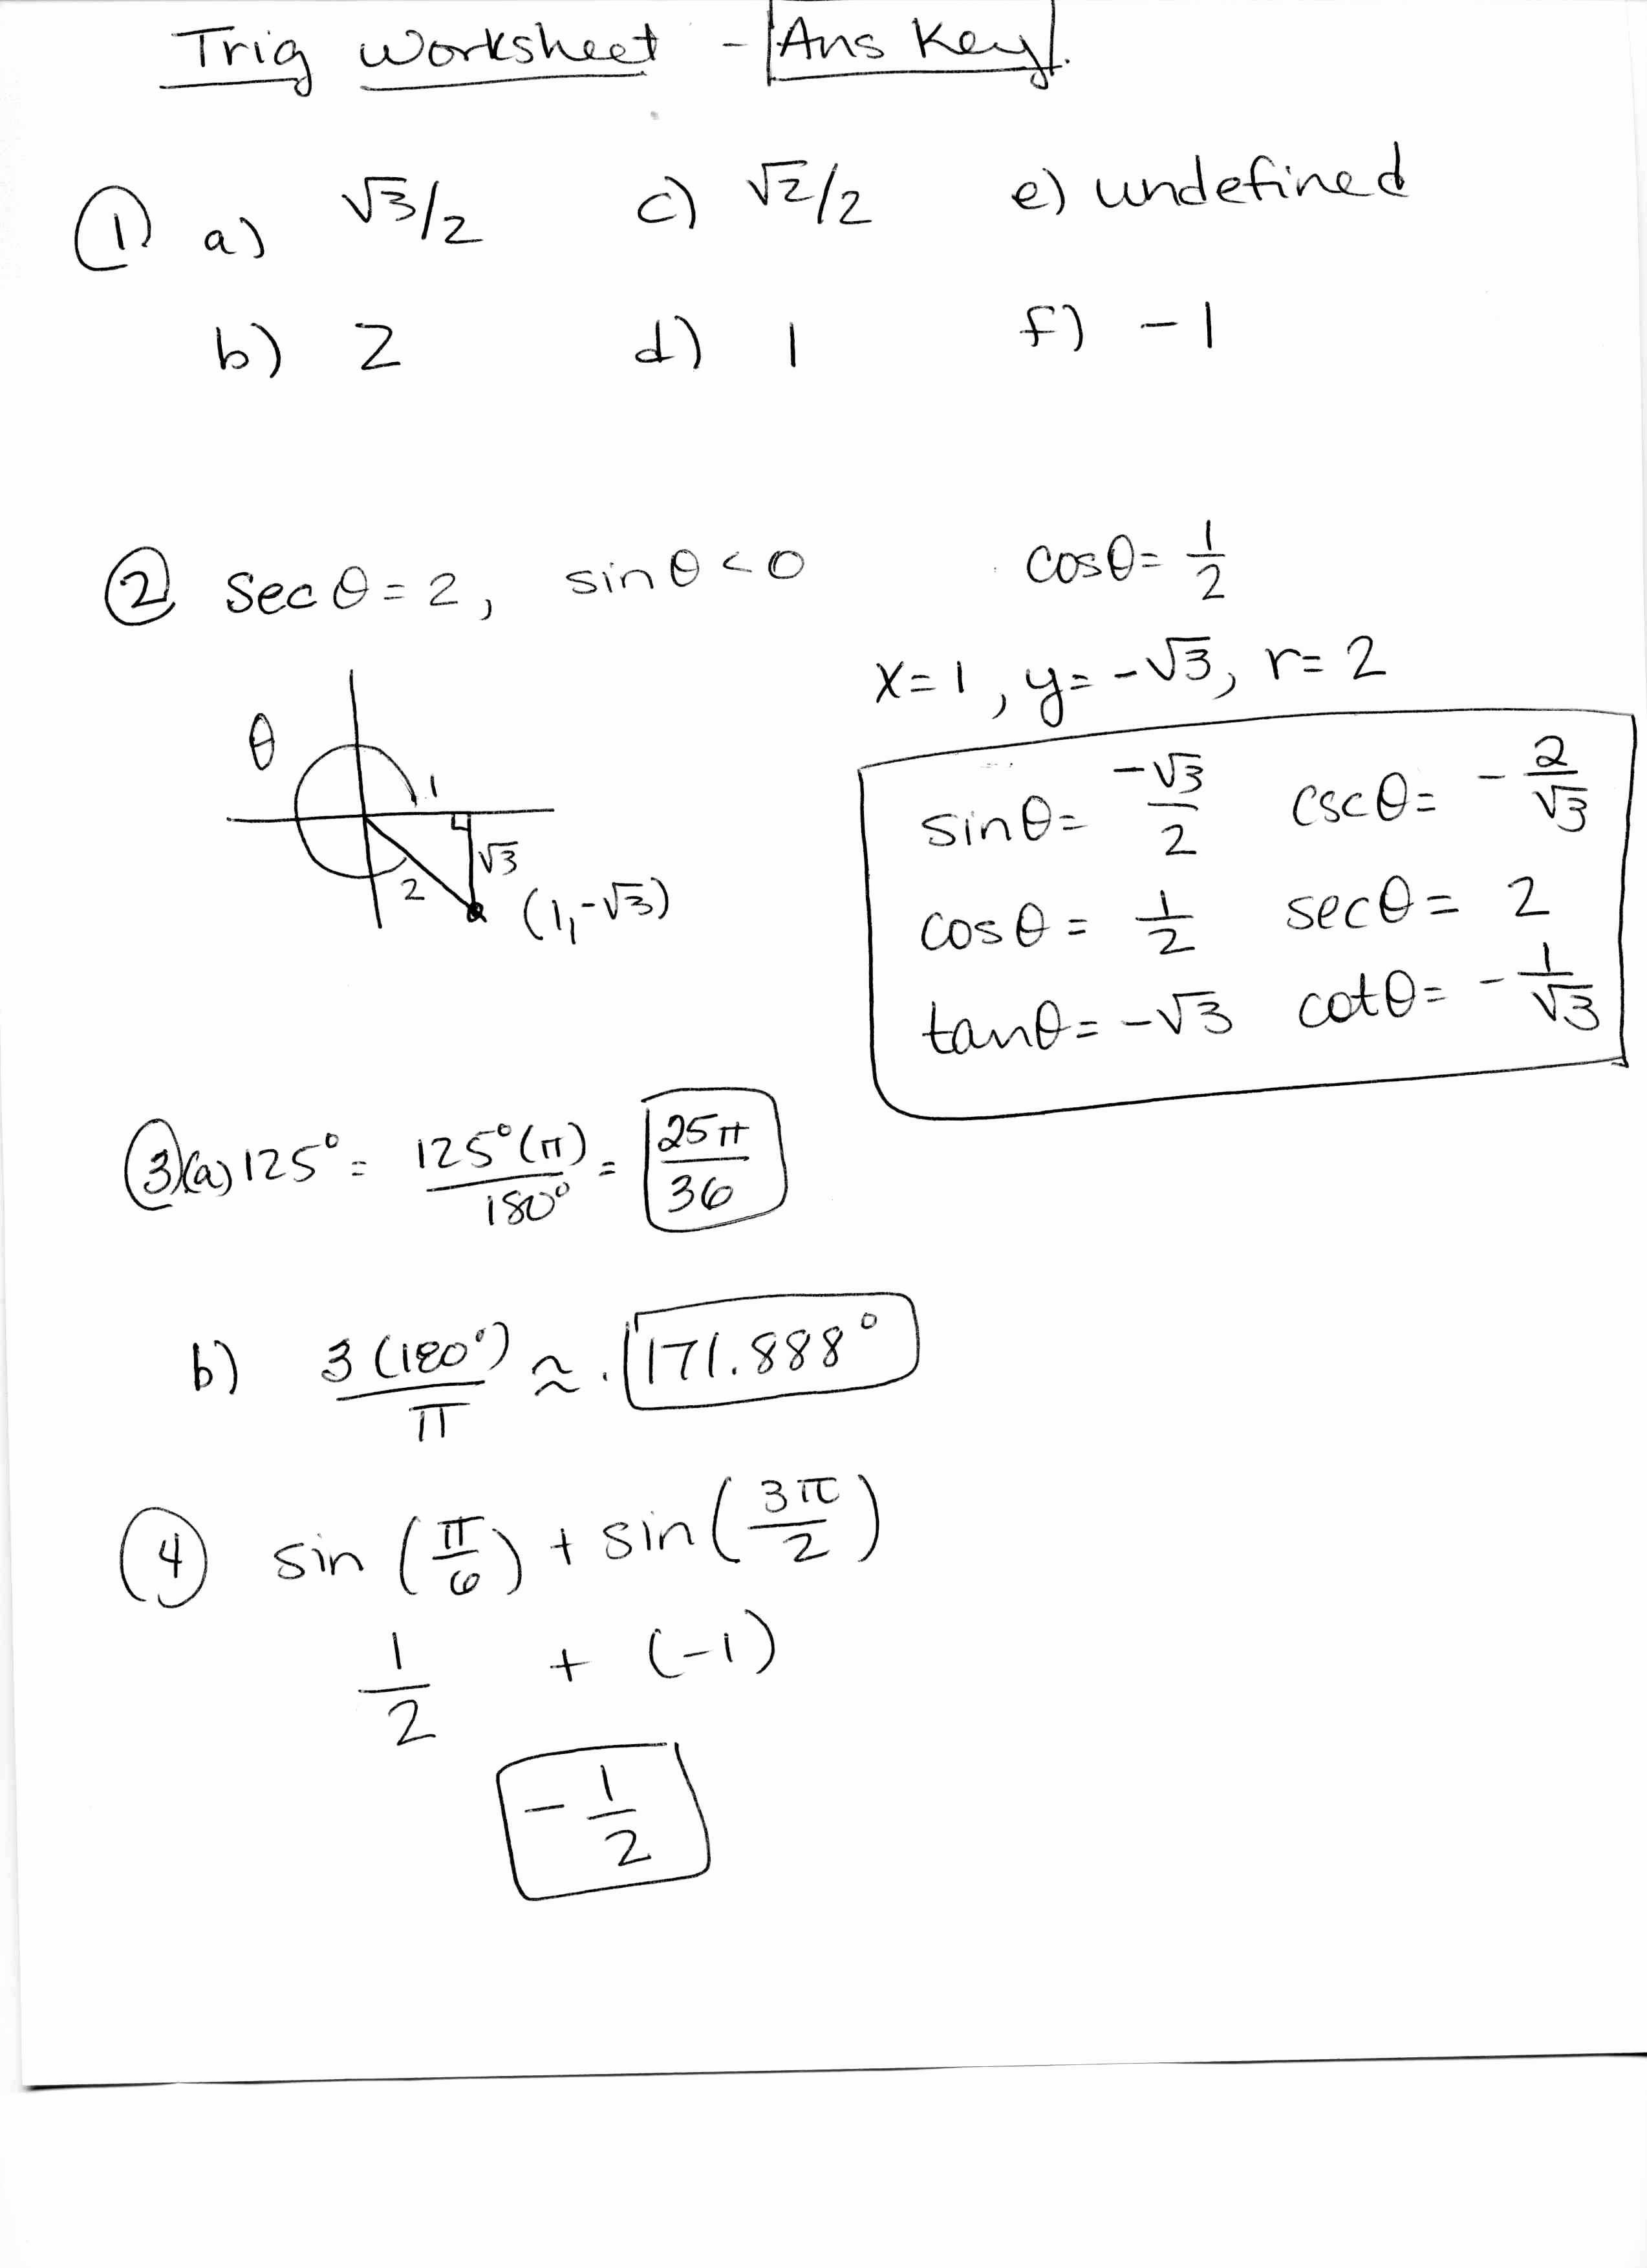 Trigonometry Unit Circle Worksheet Answers Beautiful Trigonometry Ratios Worksheet Answers